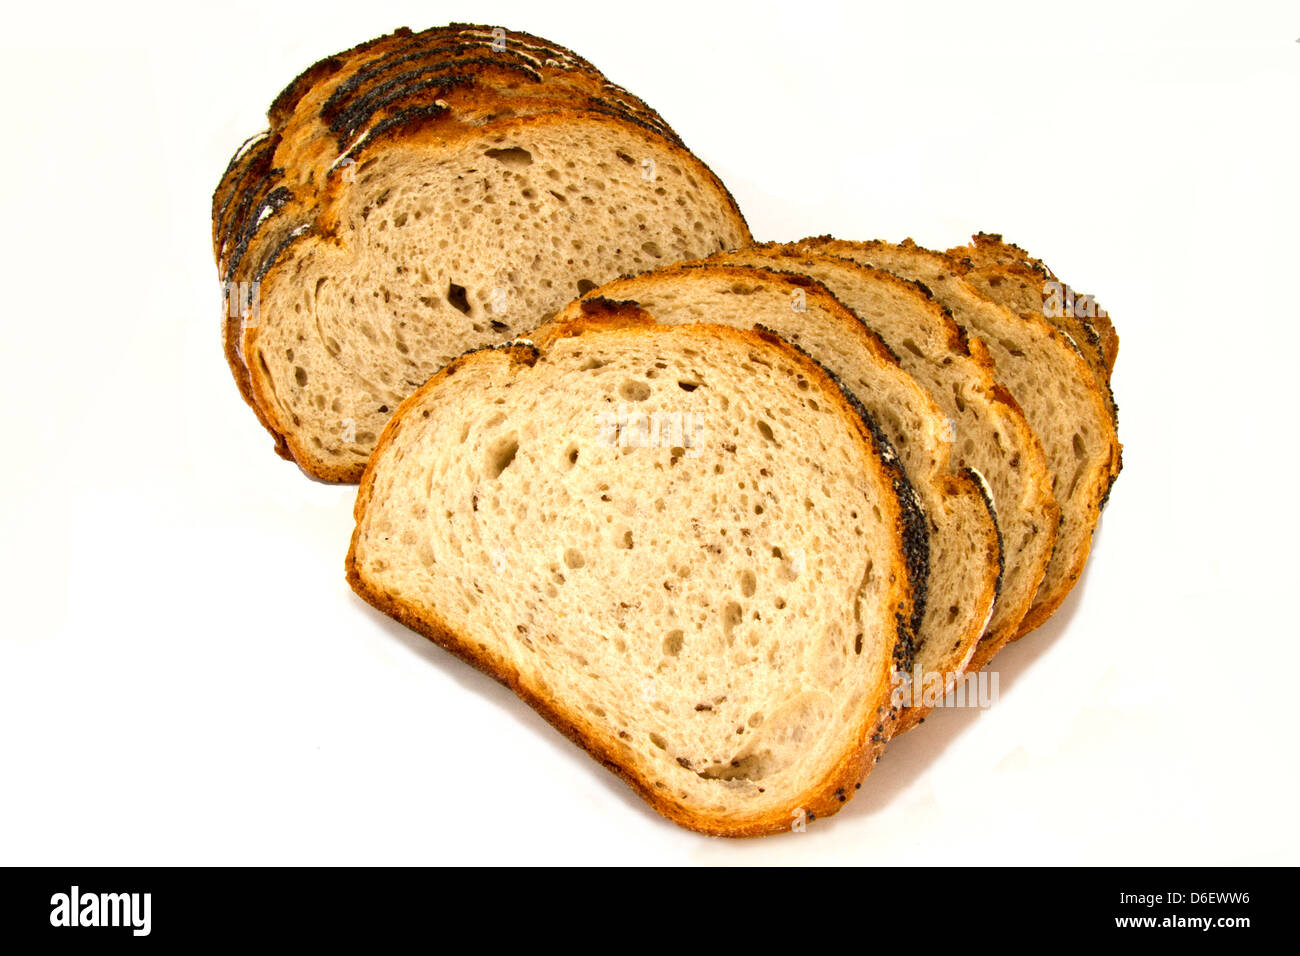 Sliced Multigrain Poppyseed loaf - Stock Image